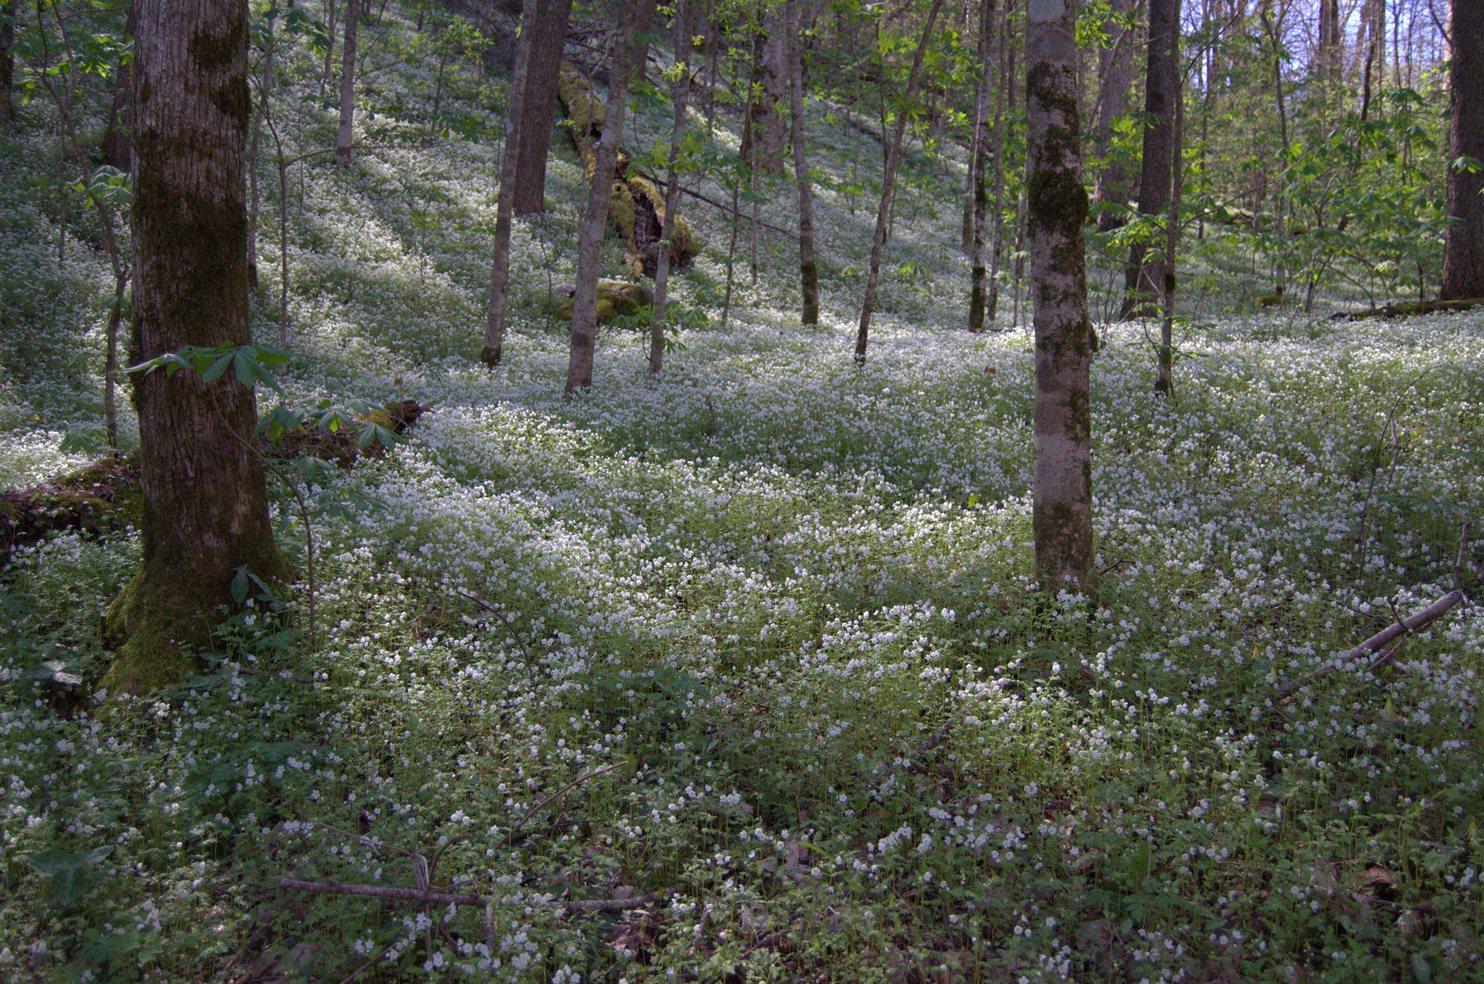 Wildflower Report Porters Creek Forest 4-11-14